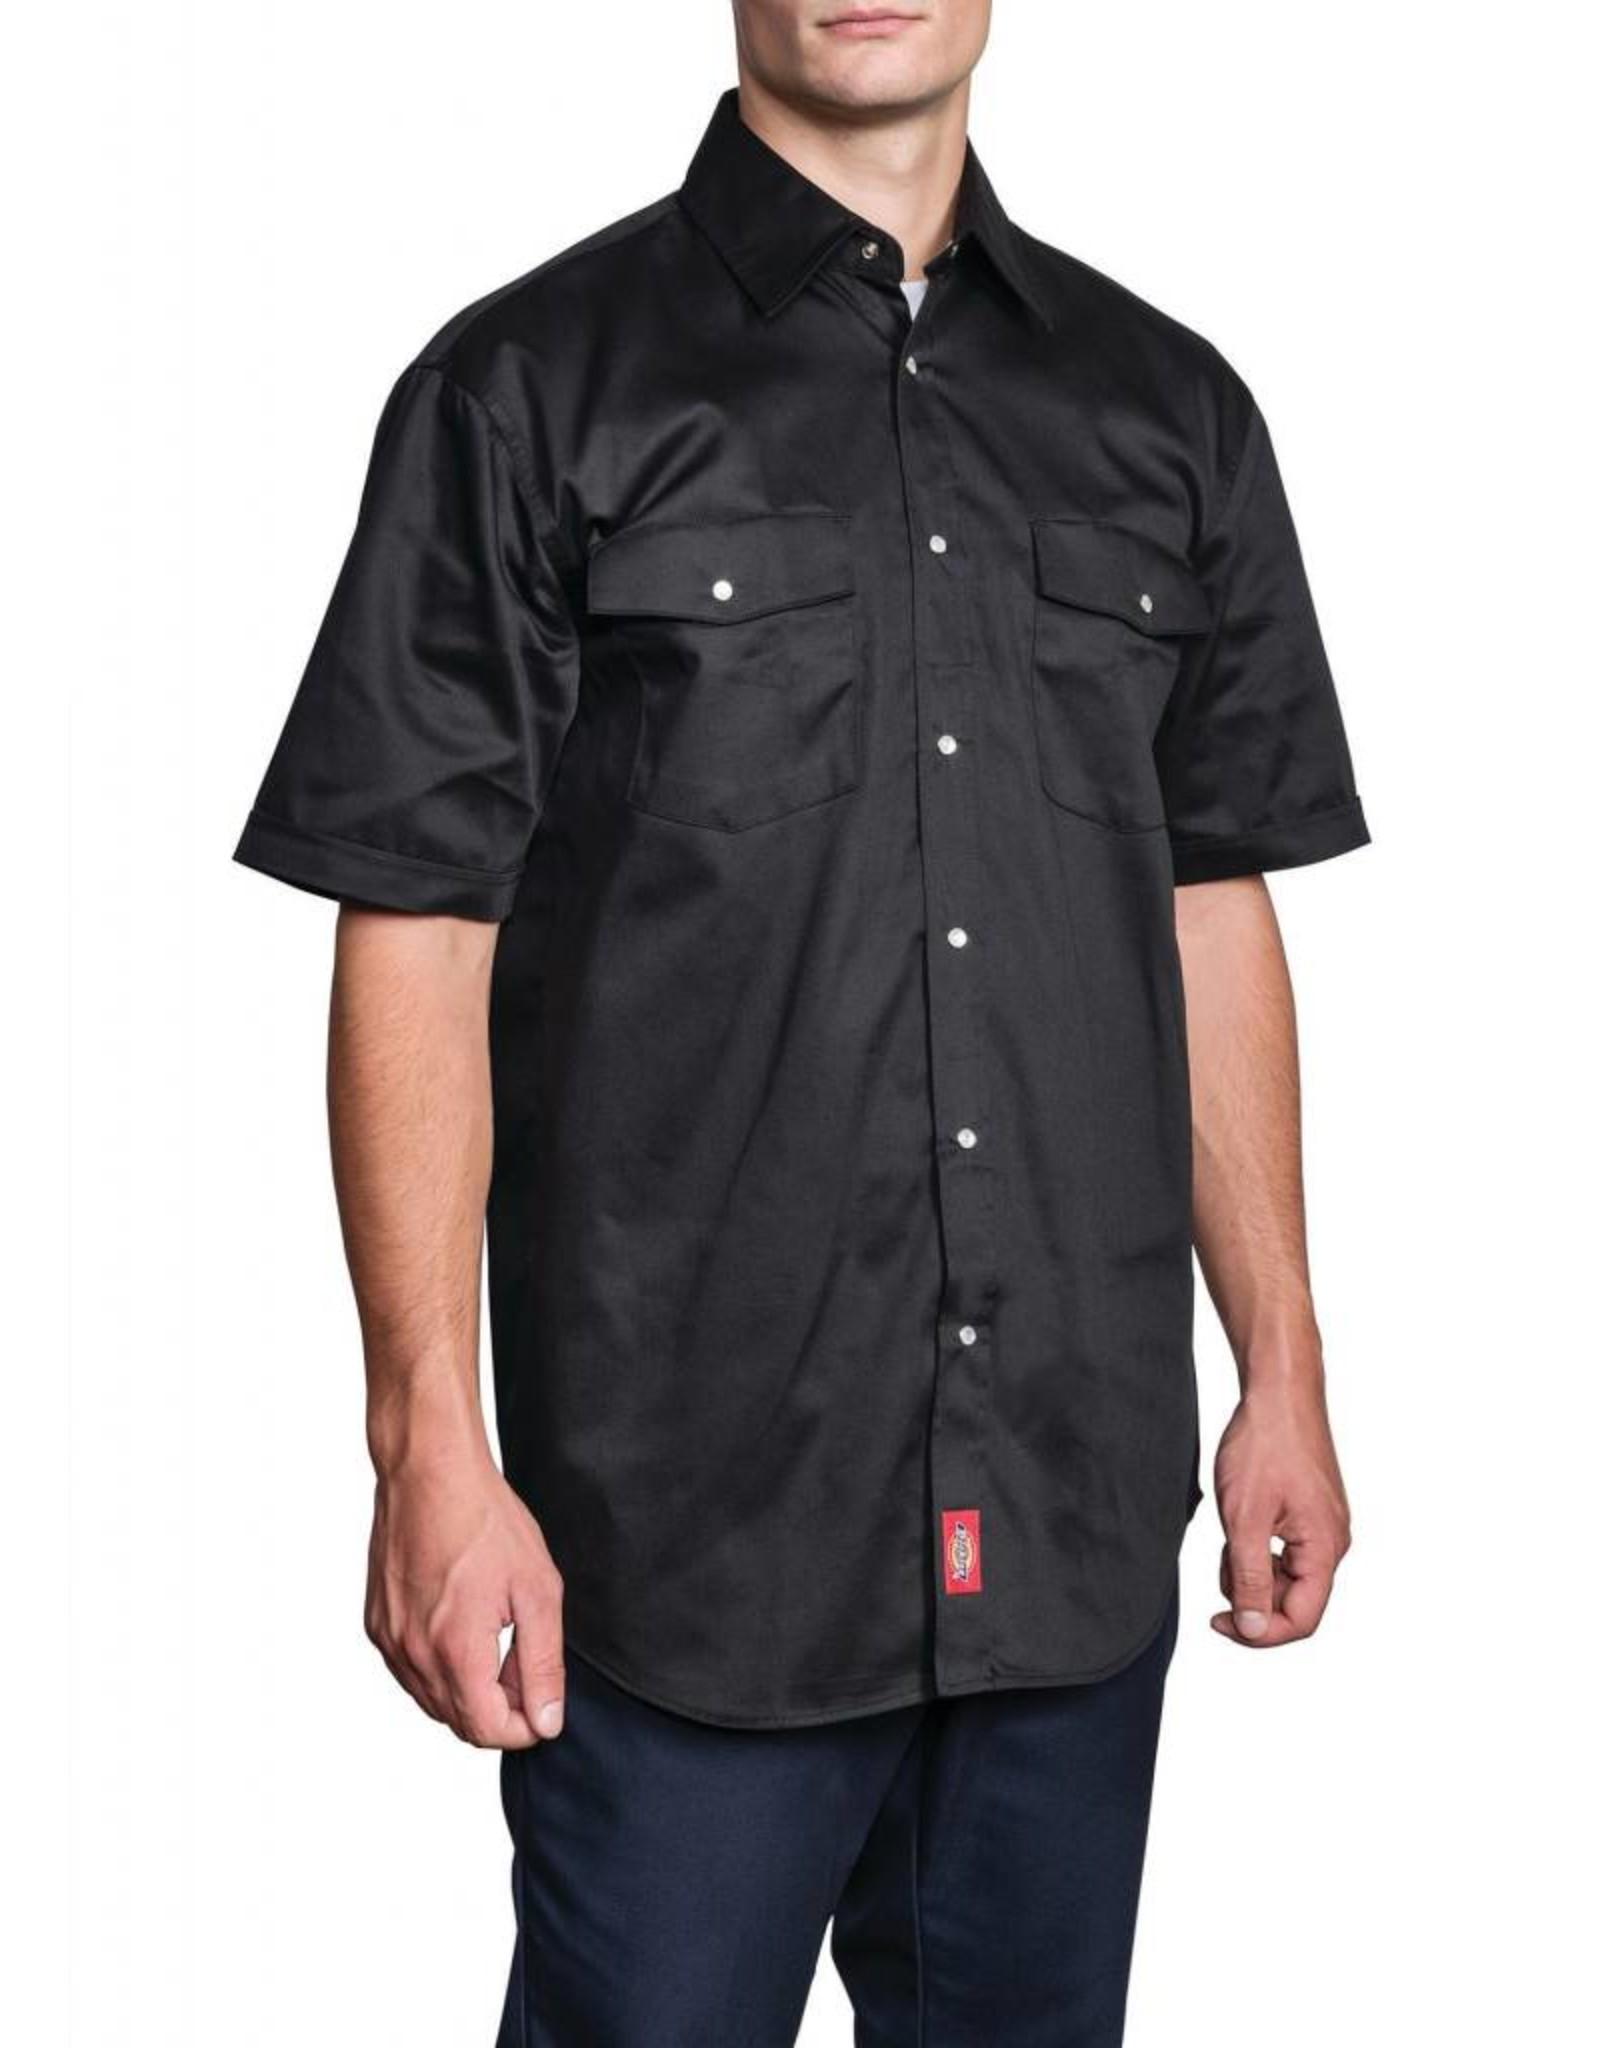 DICKIES Short Sleeve Snap Work Shirt